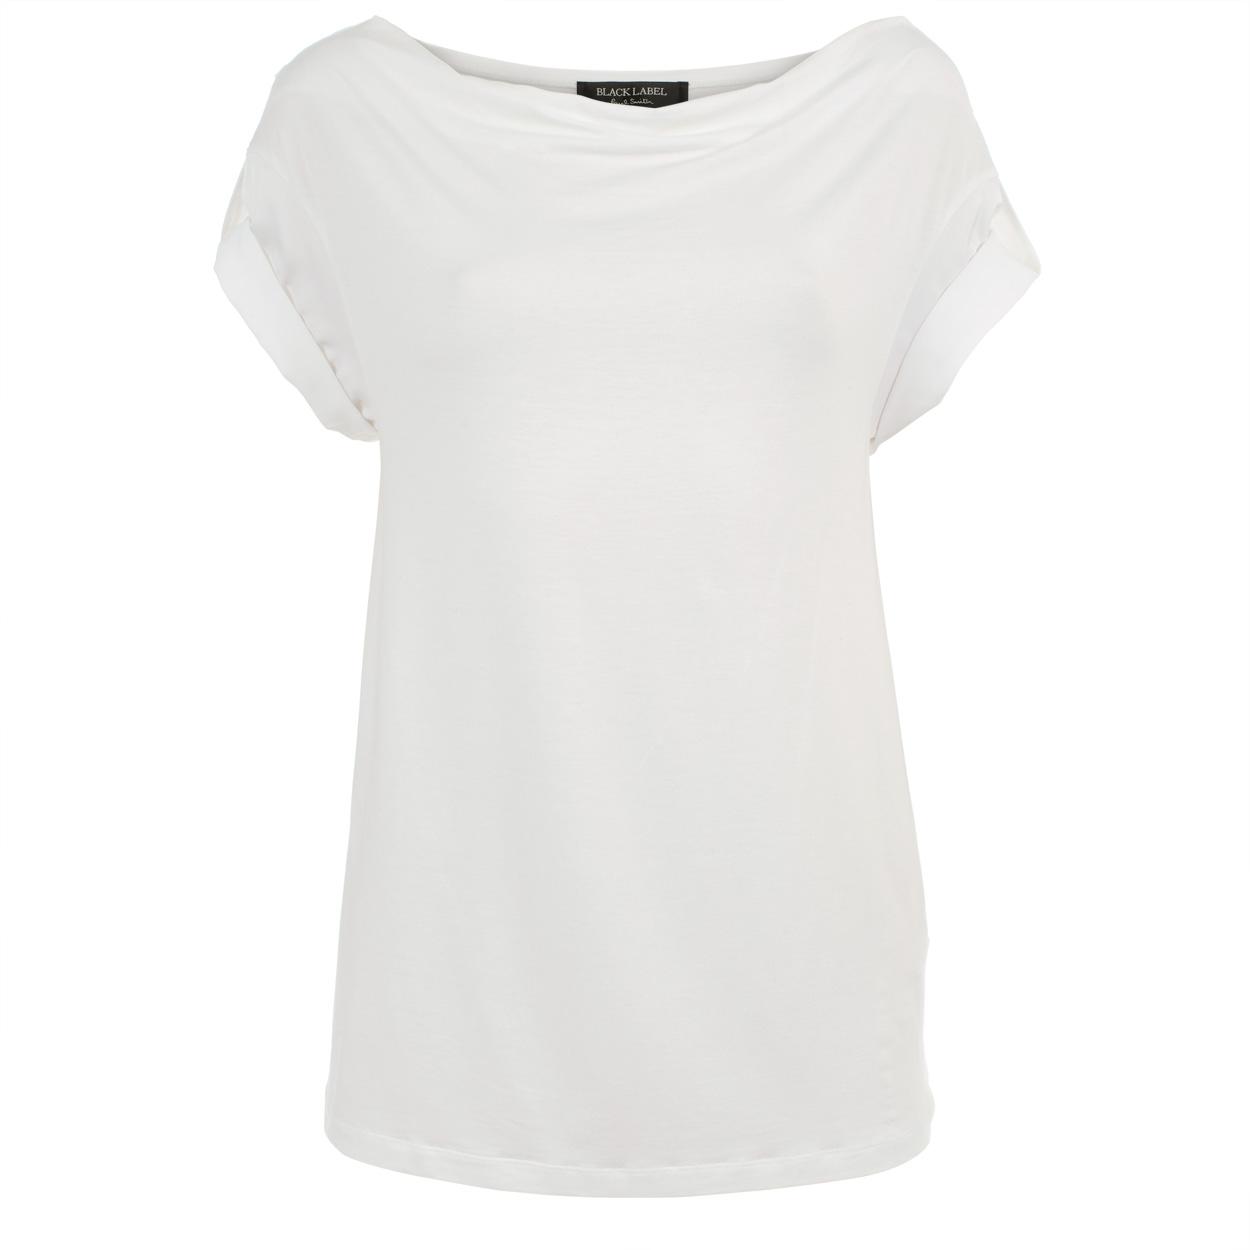 T shirt plain white clipart best for The best plain white t shirts